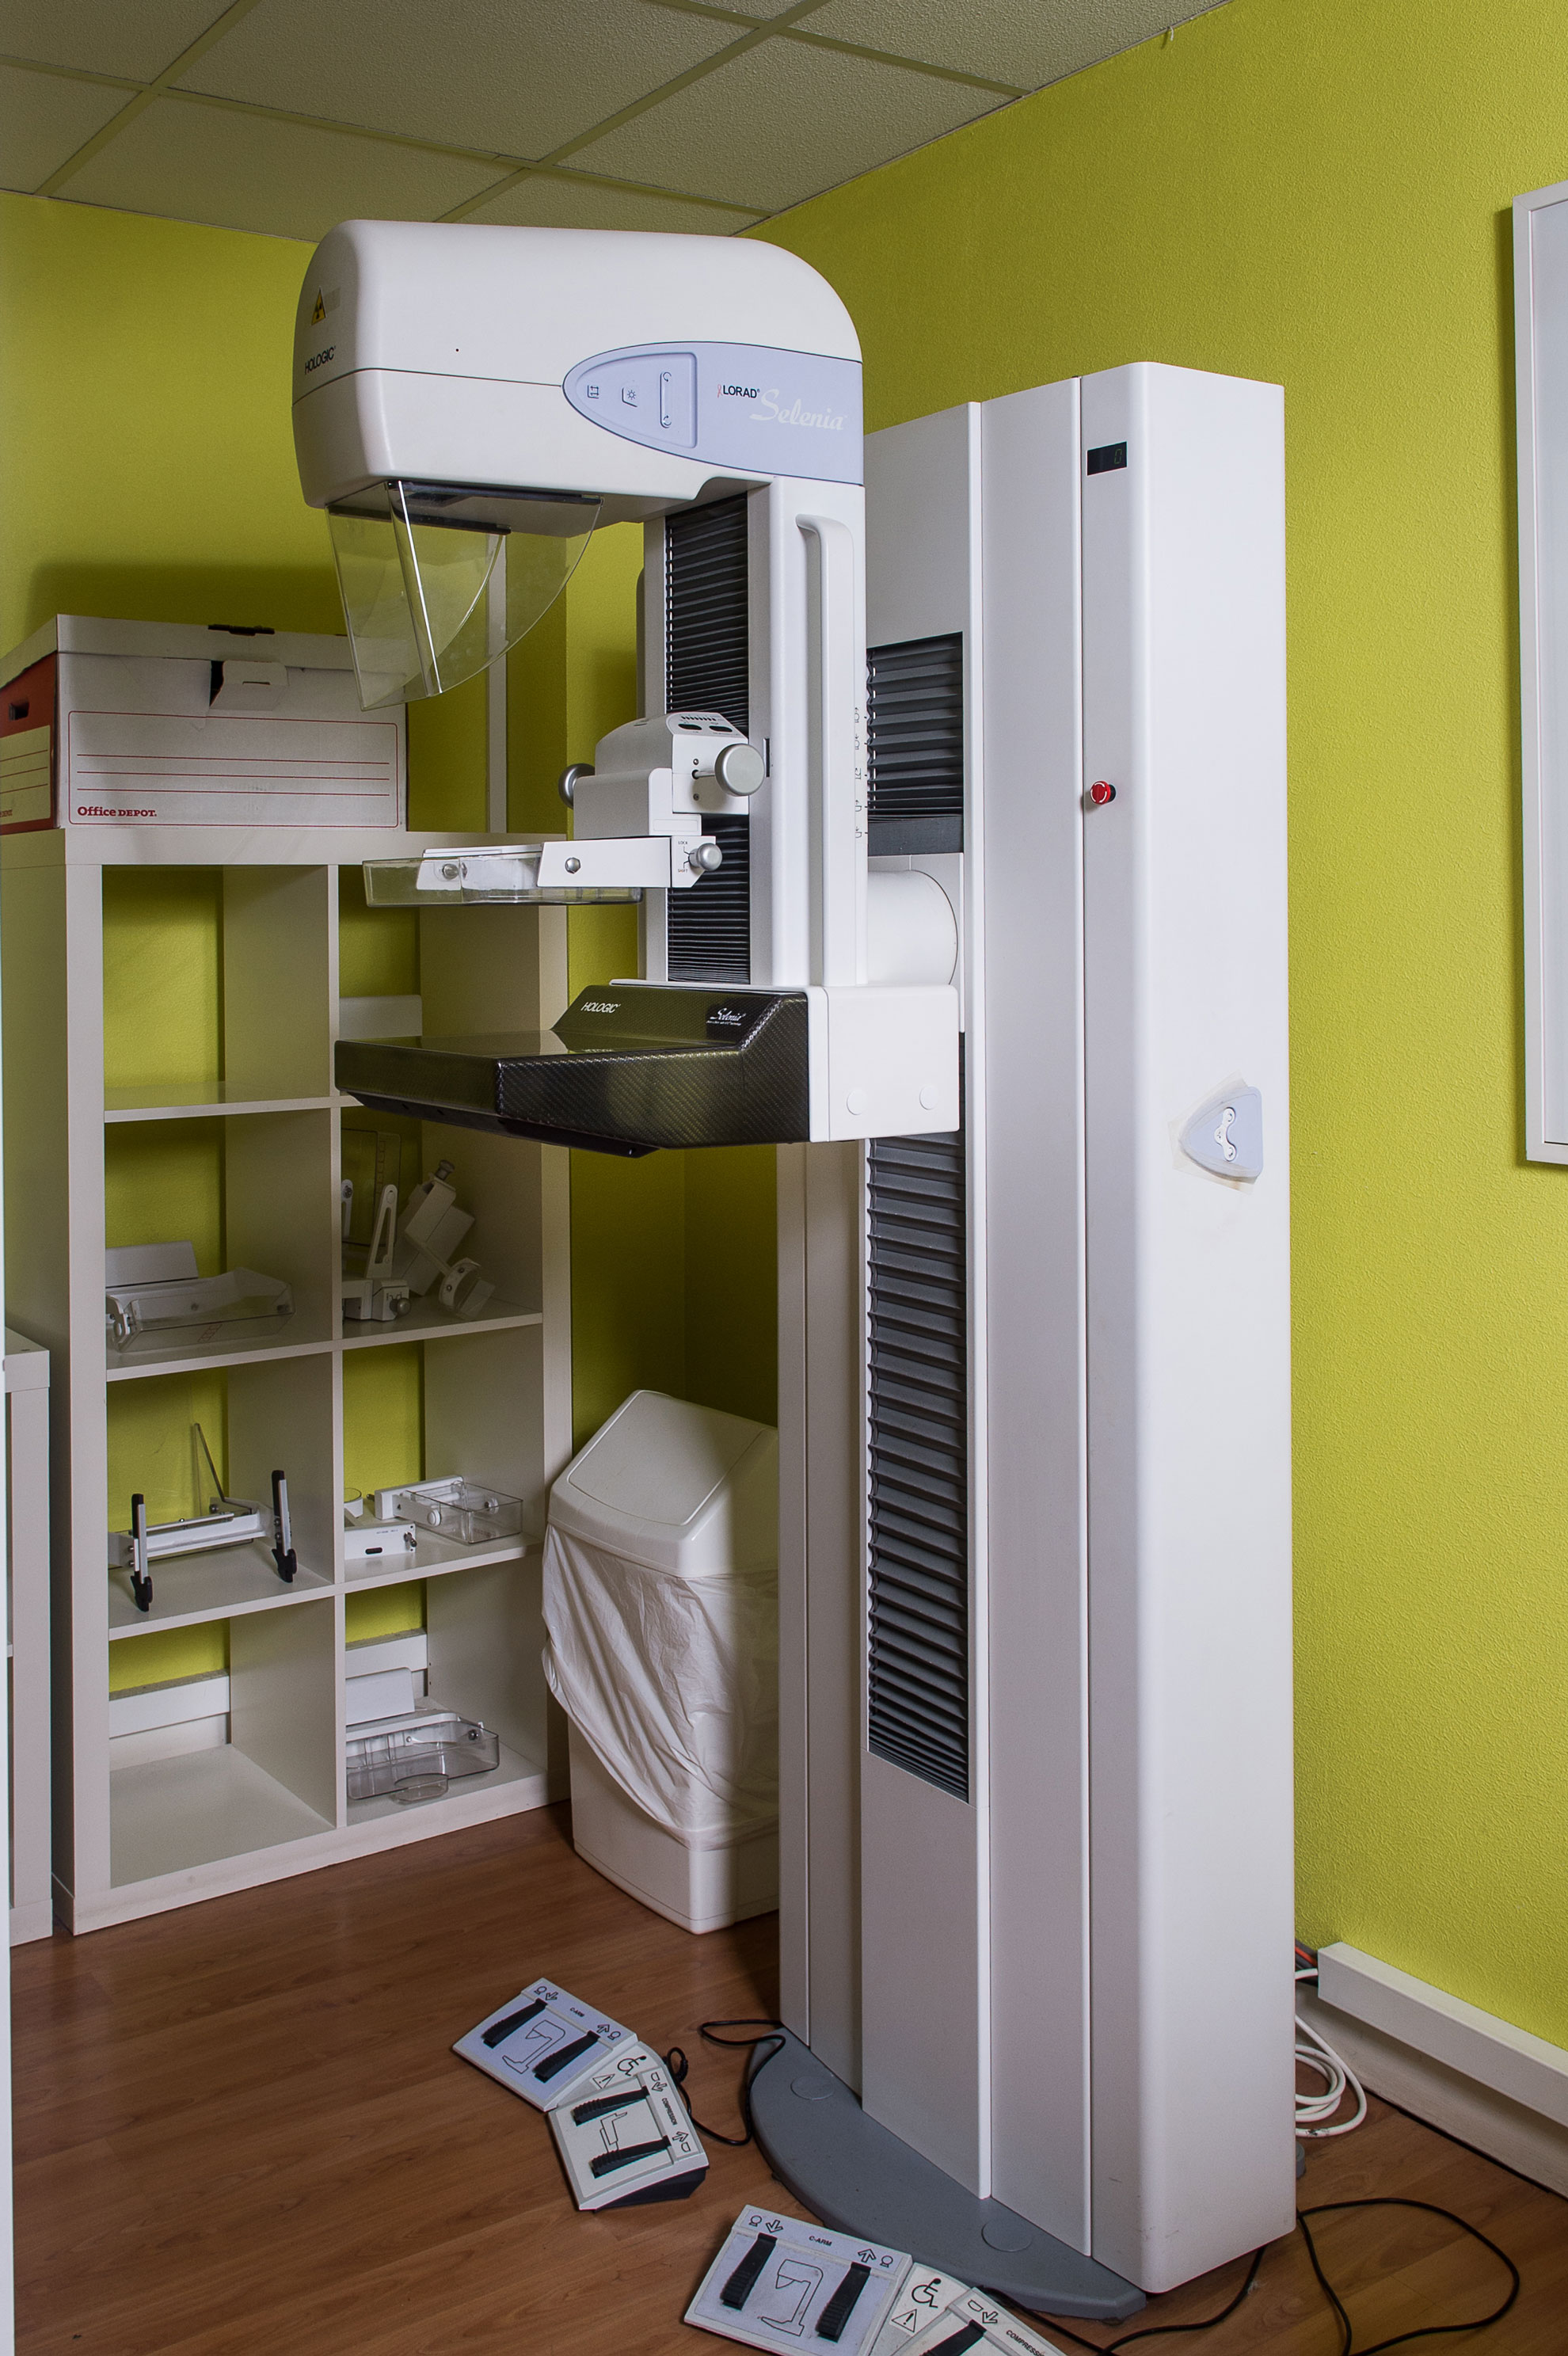 Cabinet radiologie rennes - Cabinet radiologie paris ...